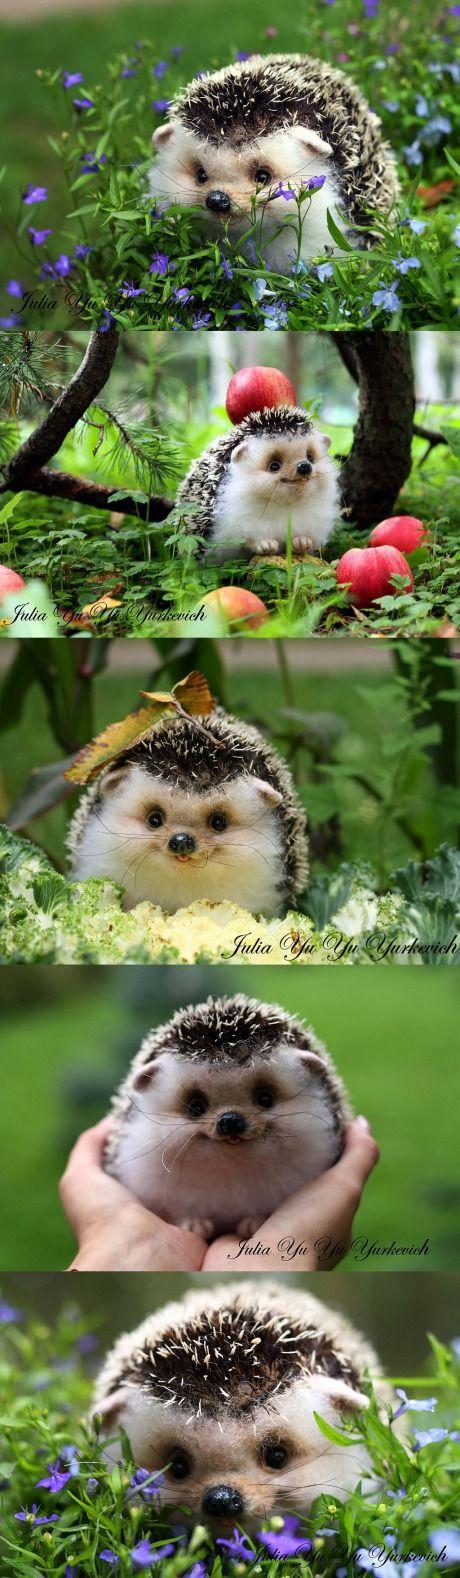 Happy hedgehog how sweet!